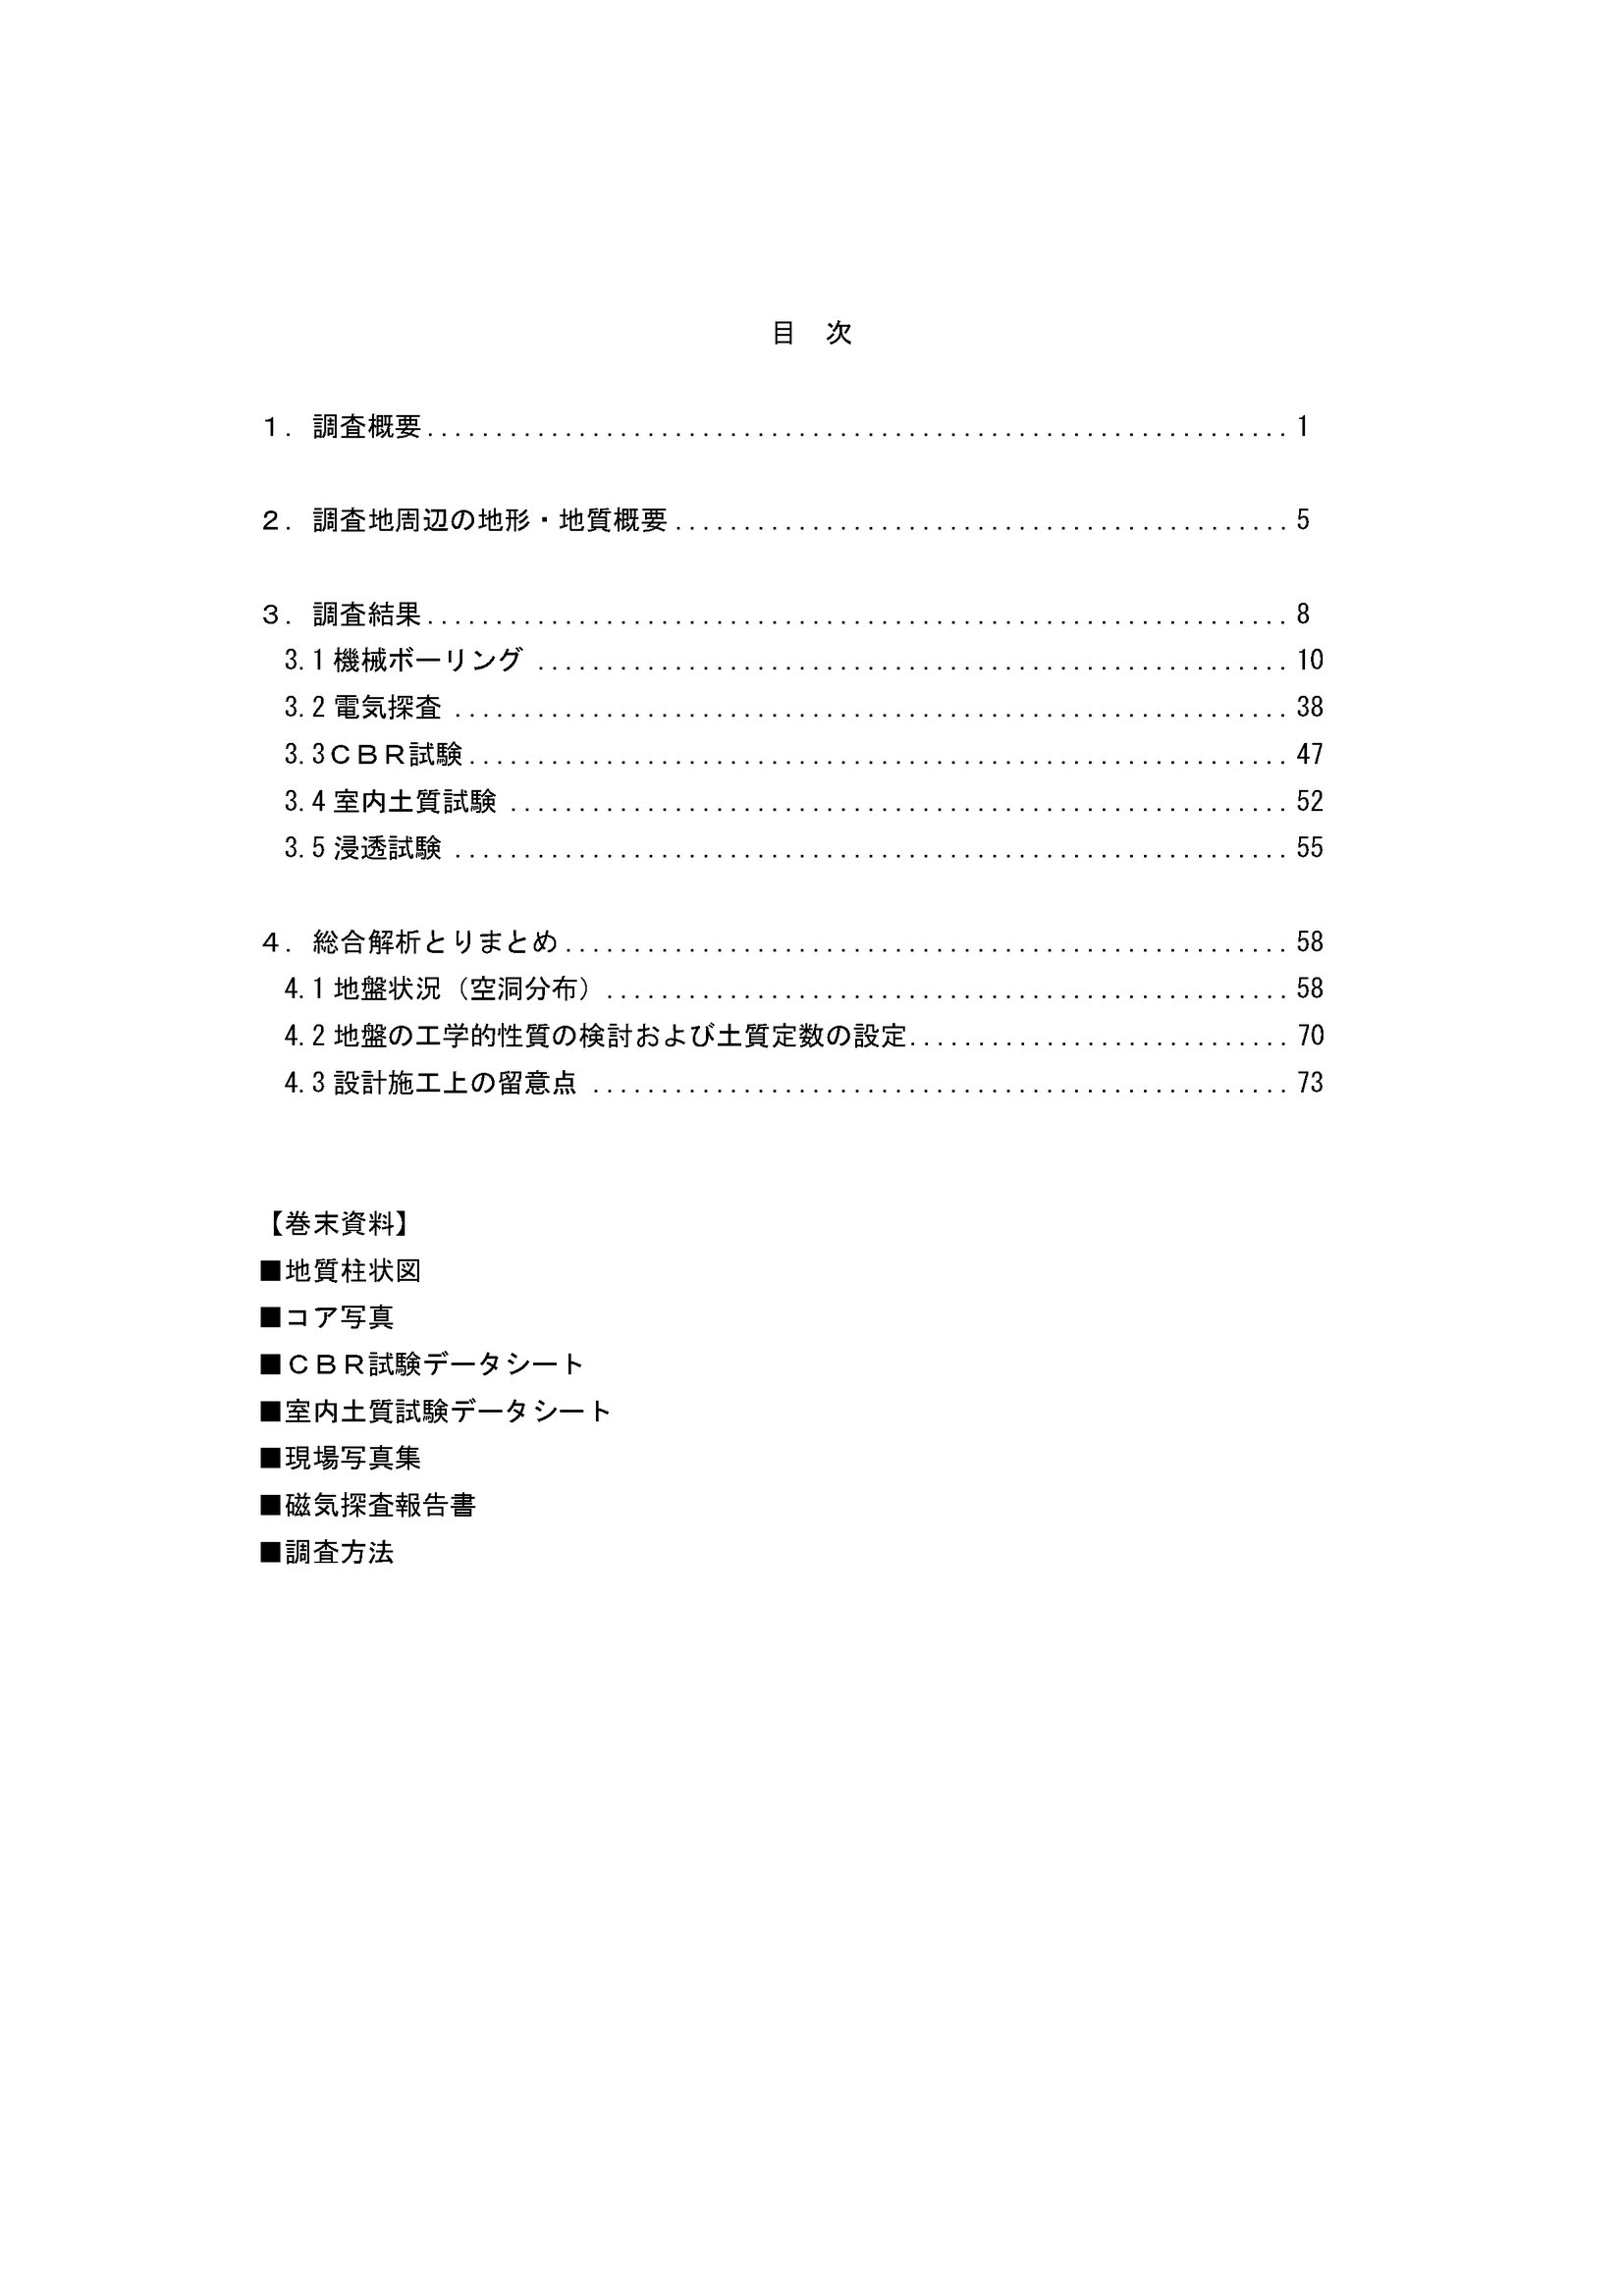 宮古島(28)駐屯地新設土質調査(その1)報告書02